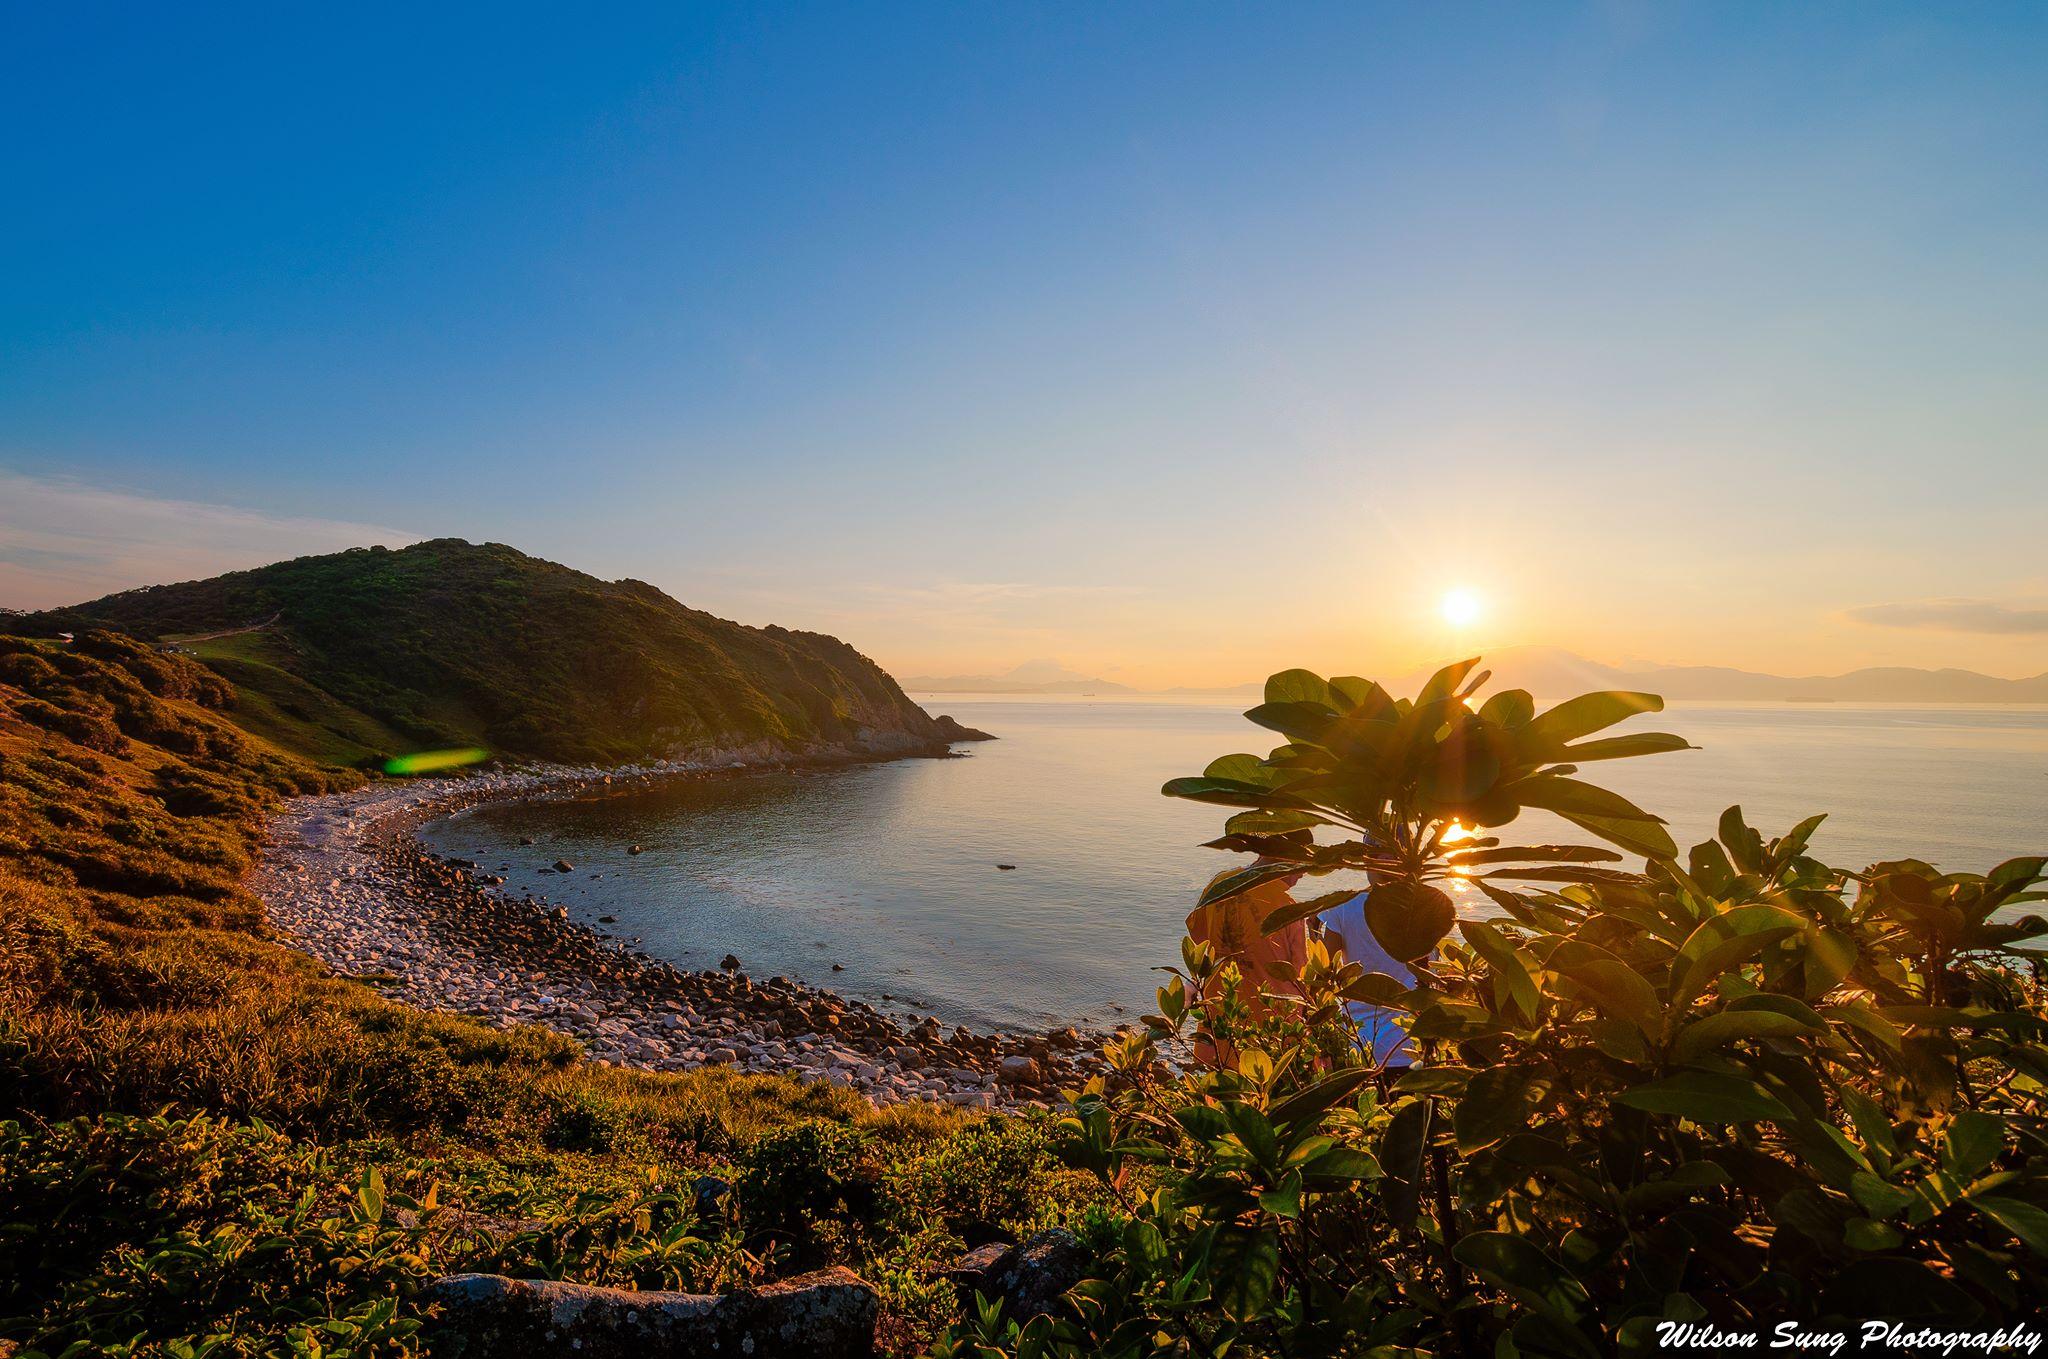 Top 10 Hiking Trails | The Hong Kong Less Traveled